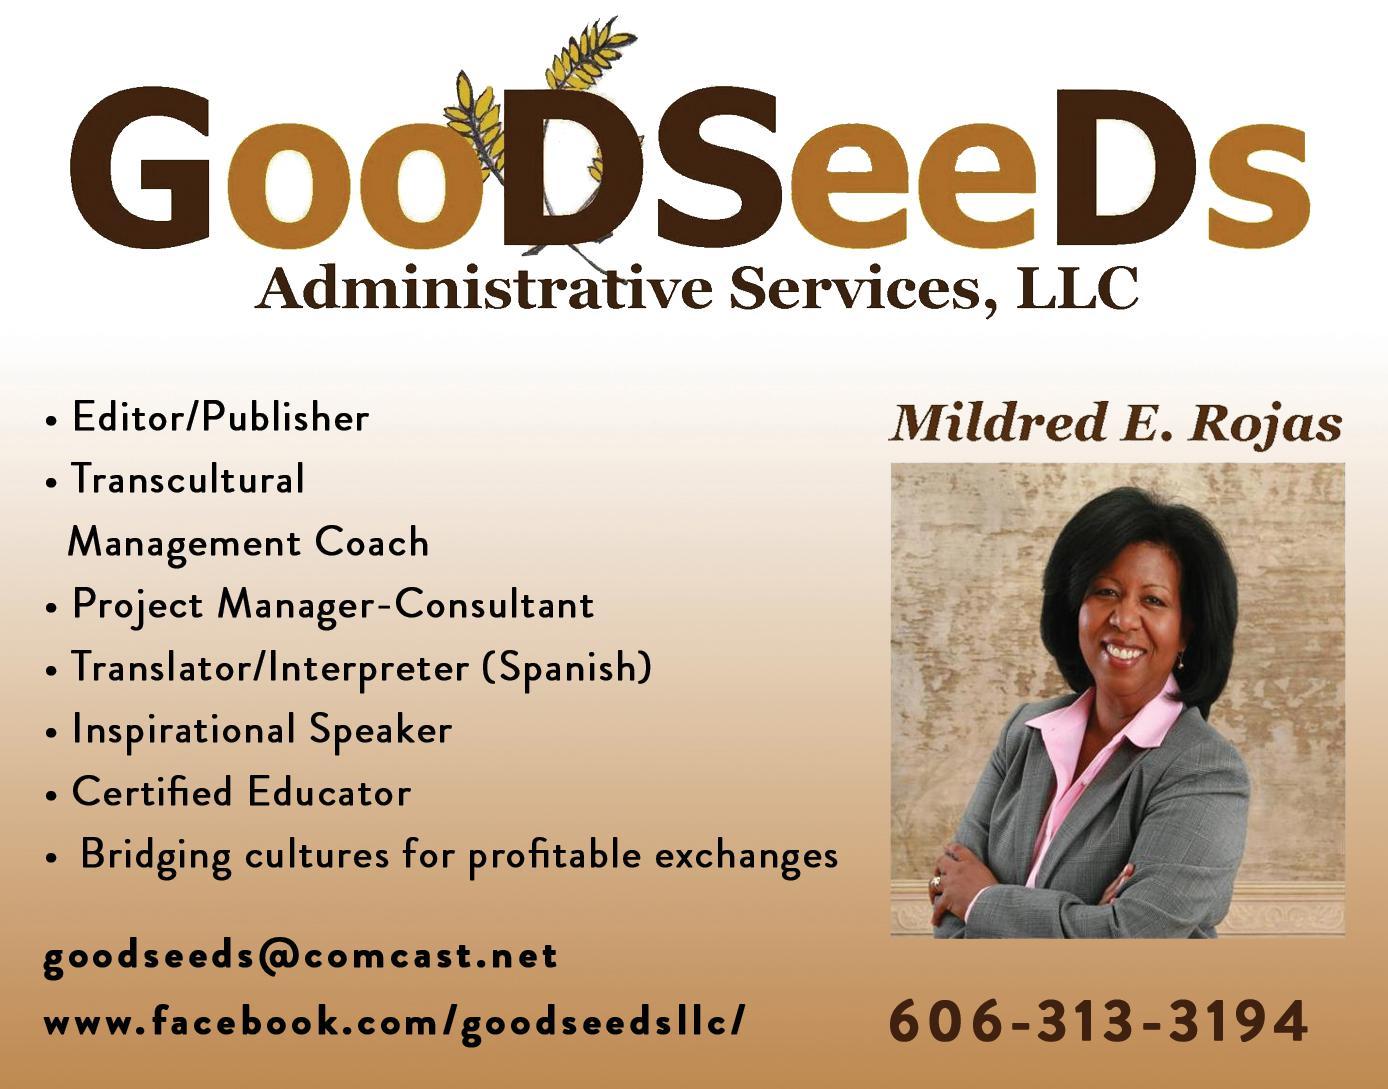 Goodseeds Services, LLC